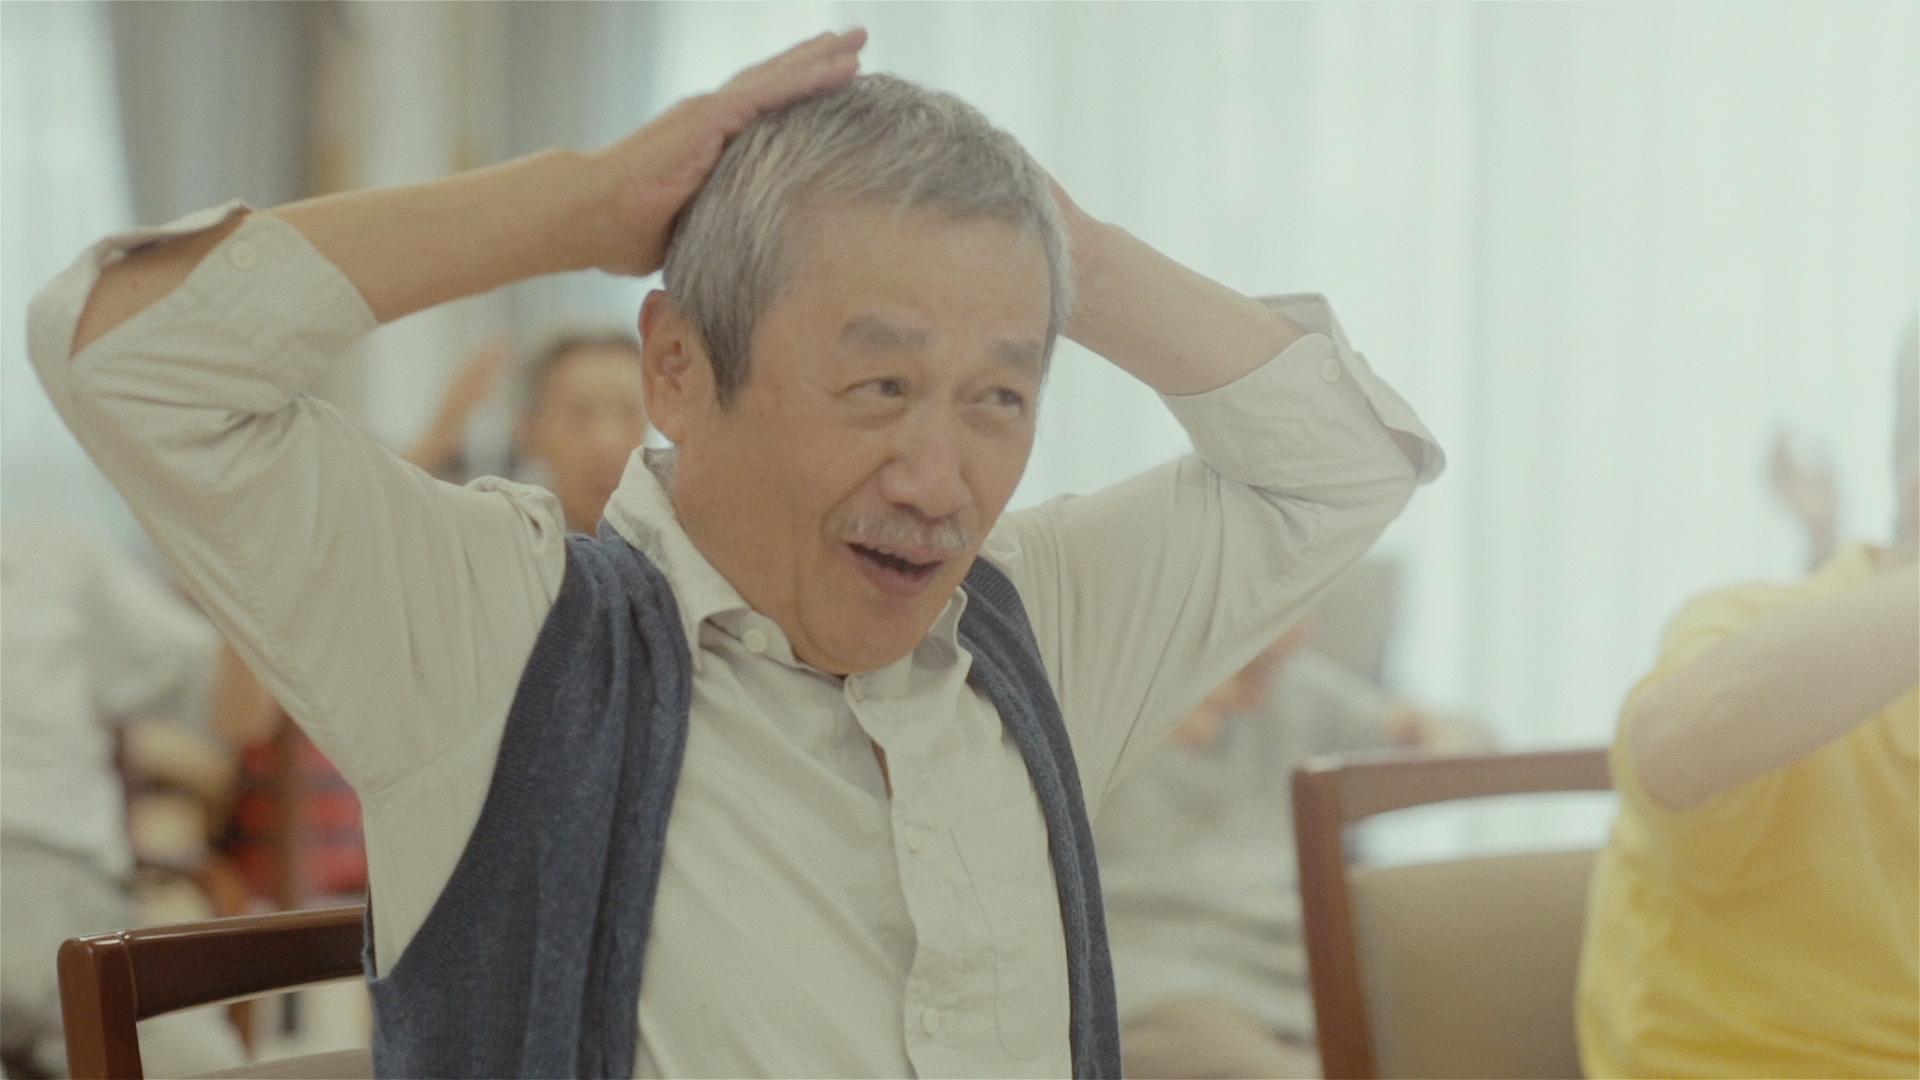 【VP】老人介護施設「ヒューマンサポート」(2016/4min)